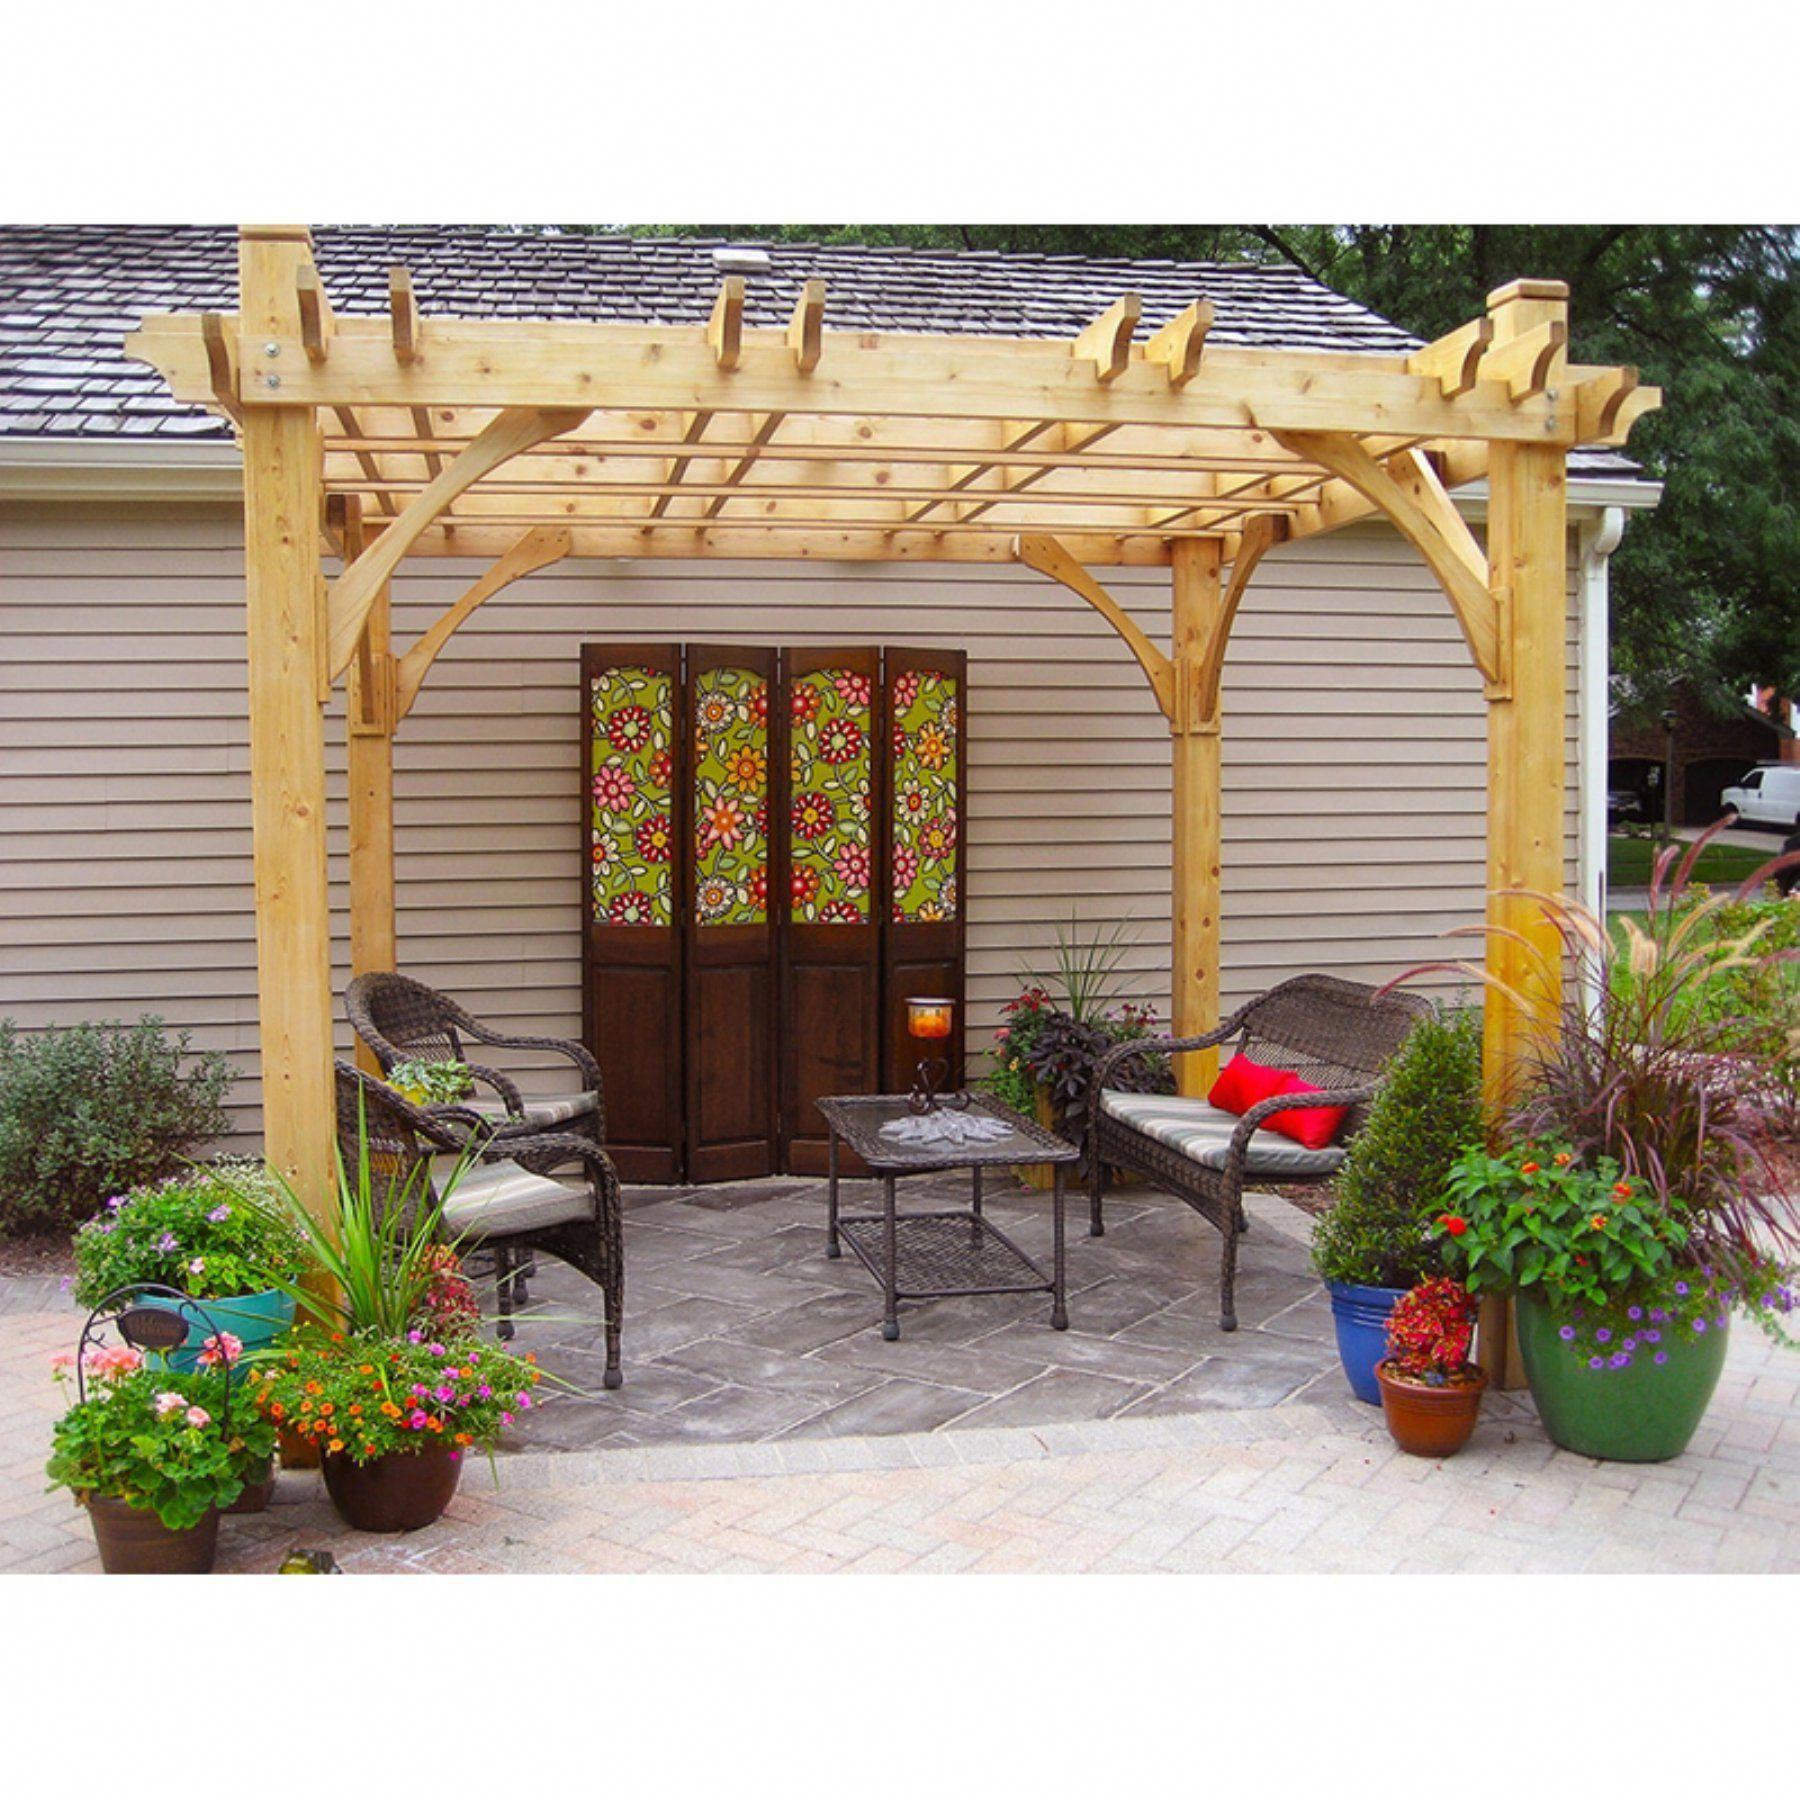 Rent Pergola For Wedding Pergolavspavilion Pergolanewyorkcity Outdoor Pergola Backyard Pergola Curved Pergola